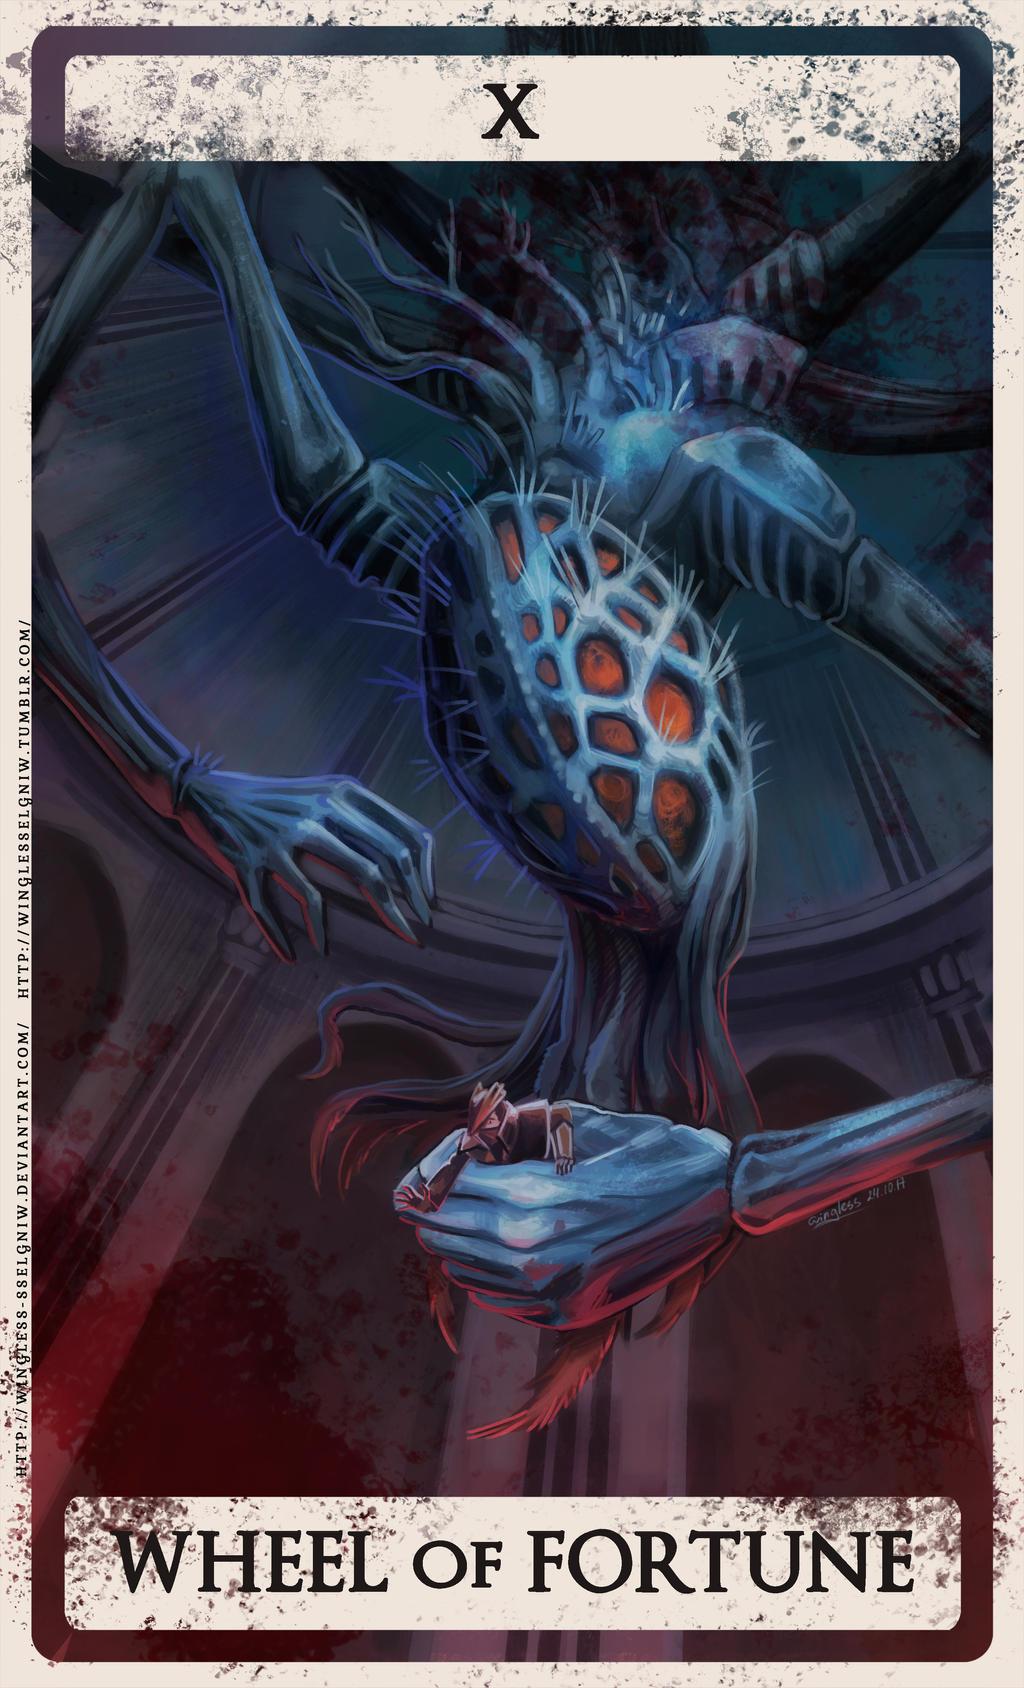 Tarot X The Wheel Of Fortune: Bloodborne Tarot X By Wingless-sselgniW On DeviantArt